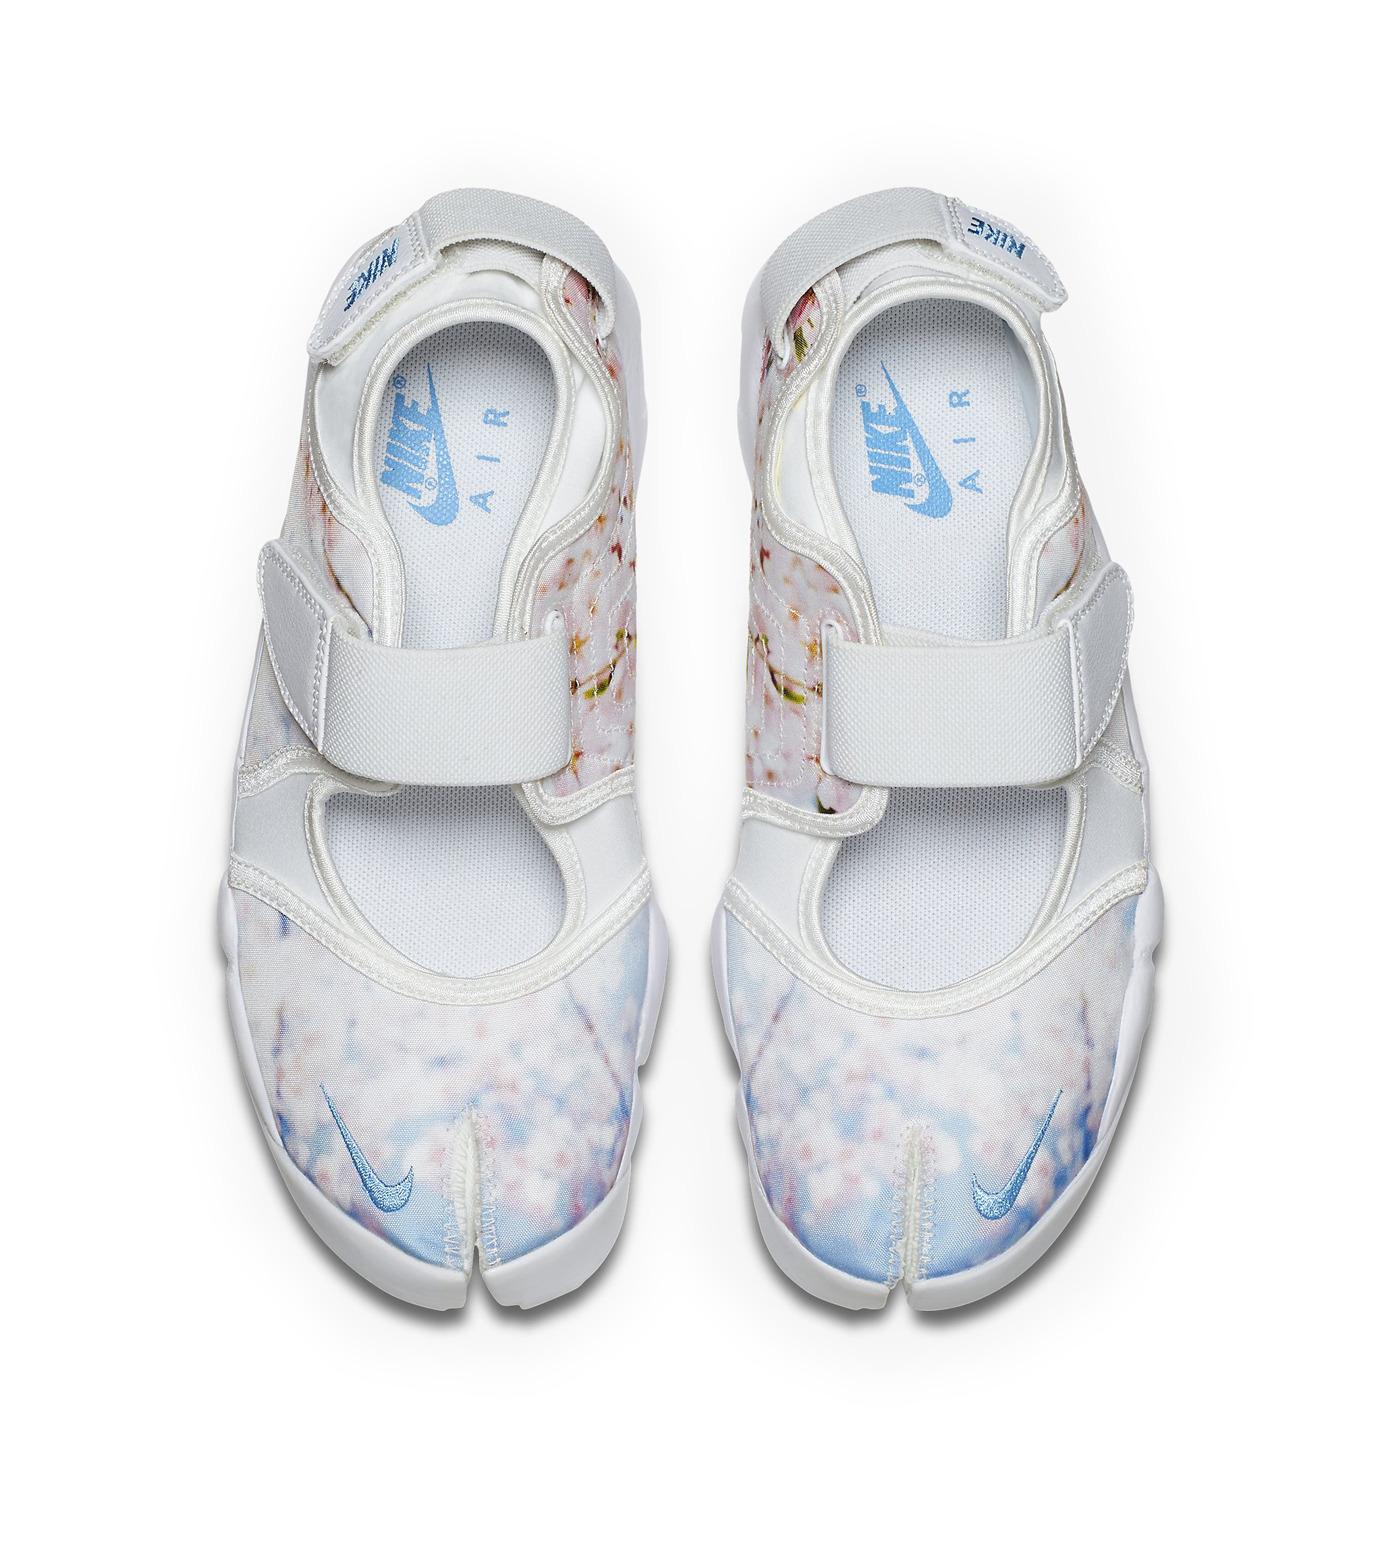 NIKE(ナイキ)のAIR RIFT PRINT-WHITE(シューズ/shoes)-807398-101-4 拡大詳細画像5